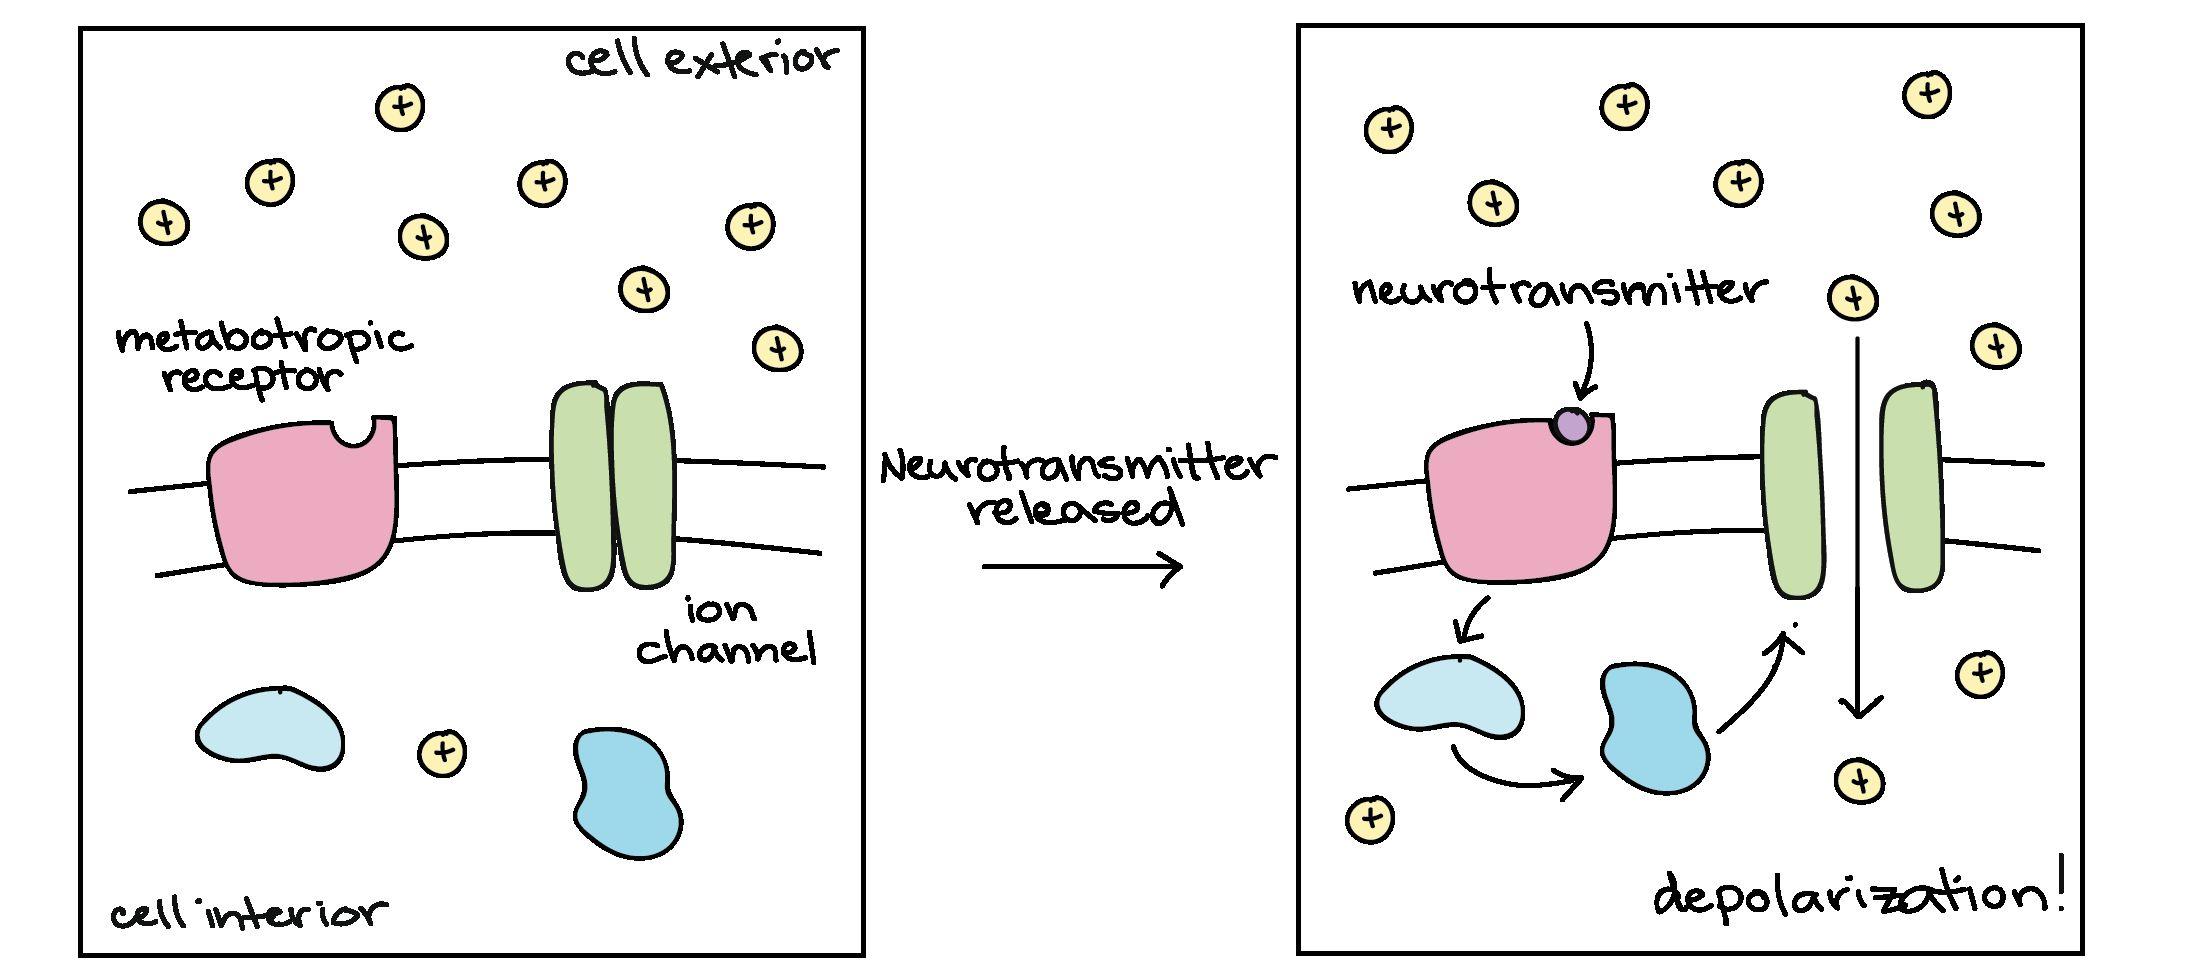 Neuron Simulation Worksheet Answers